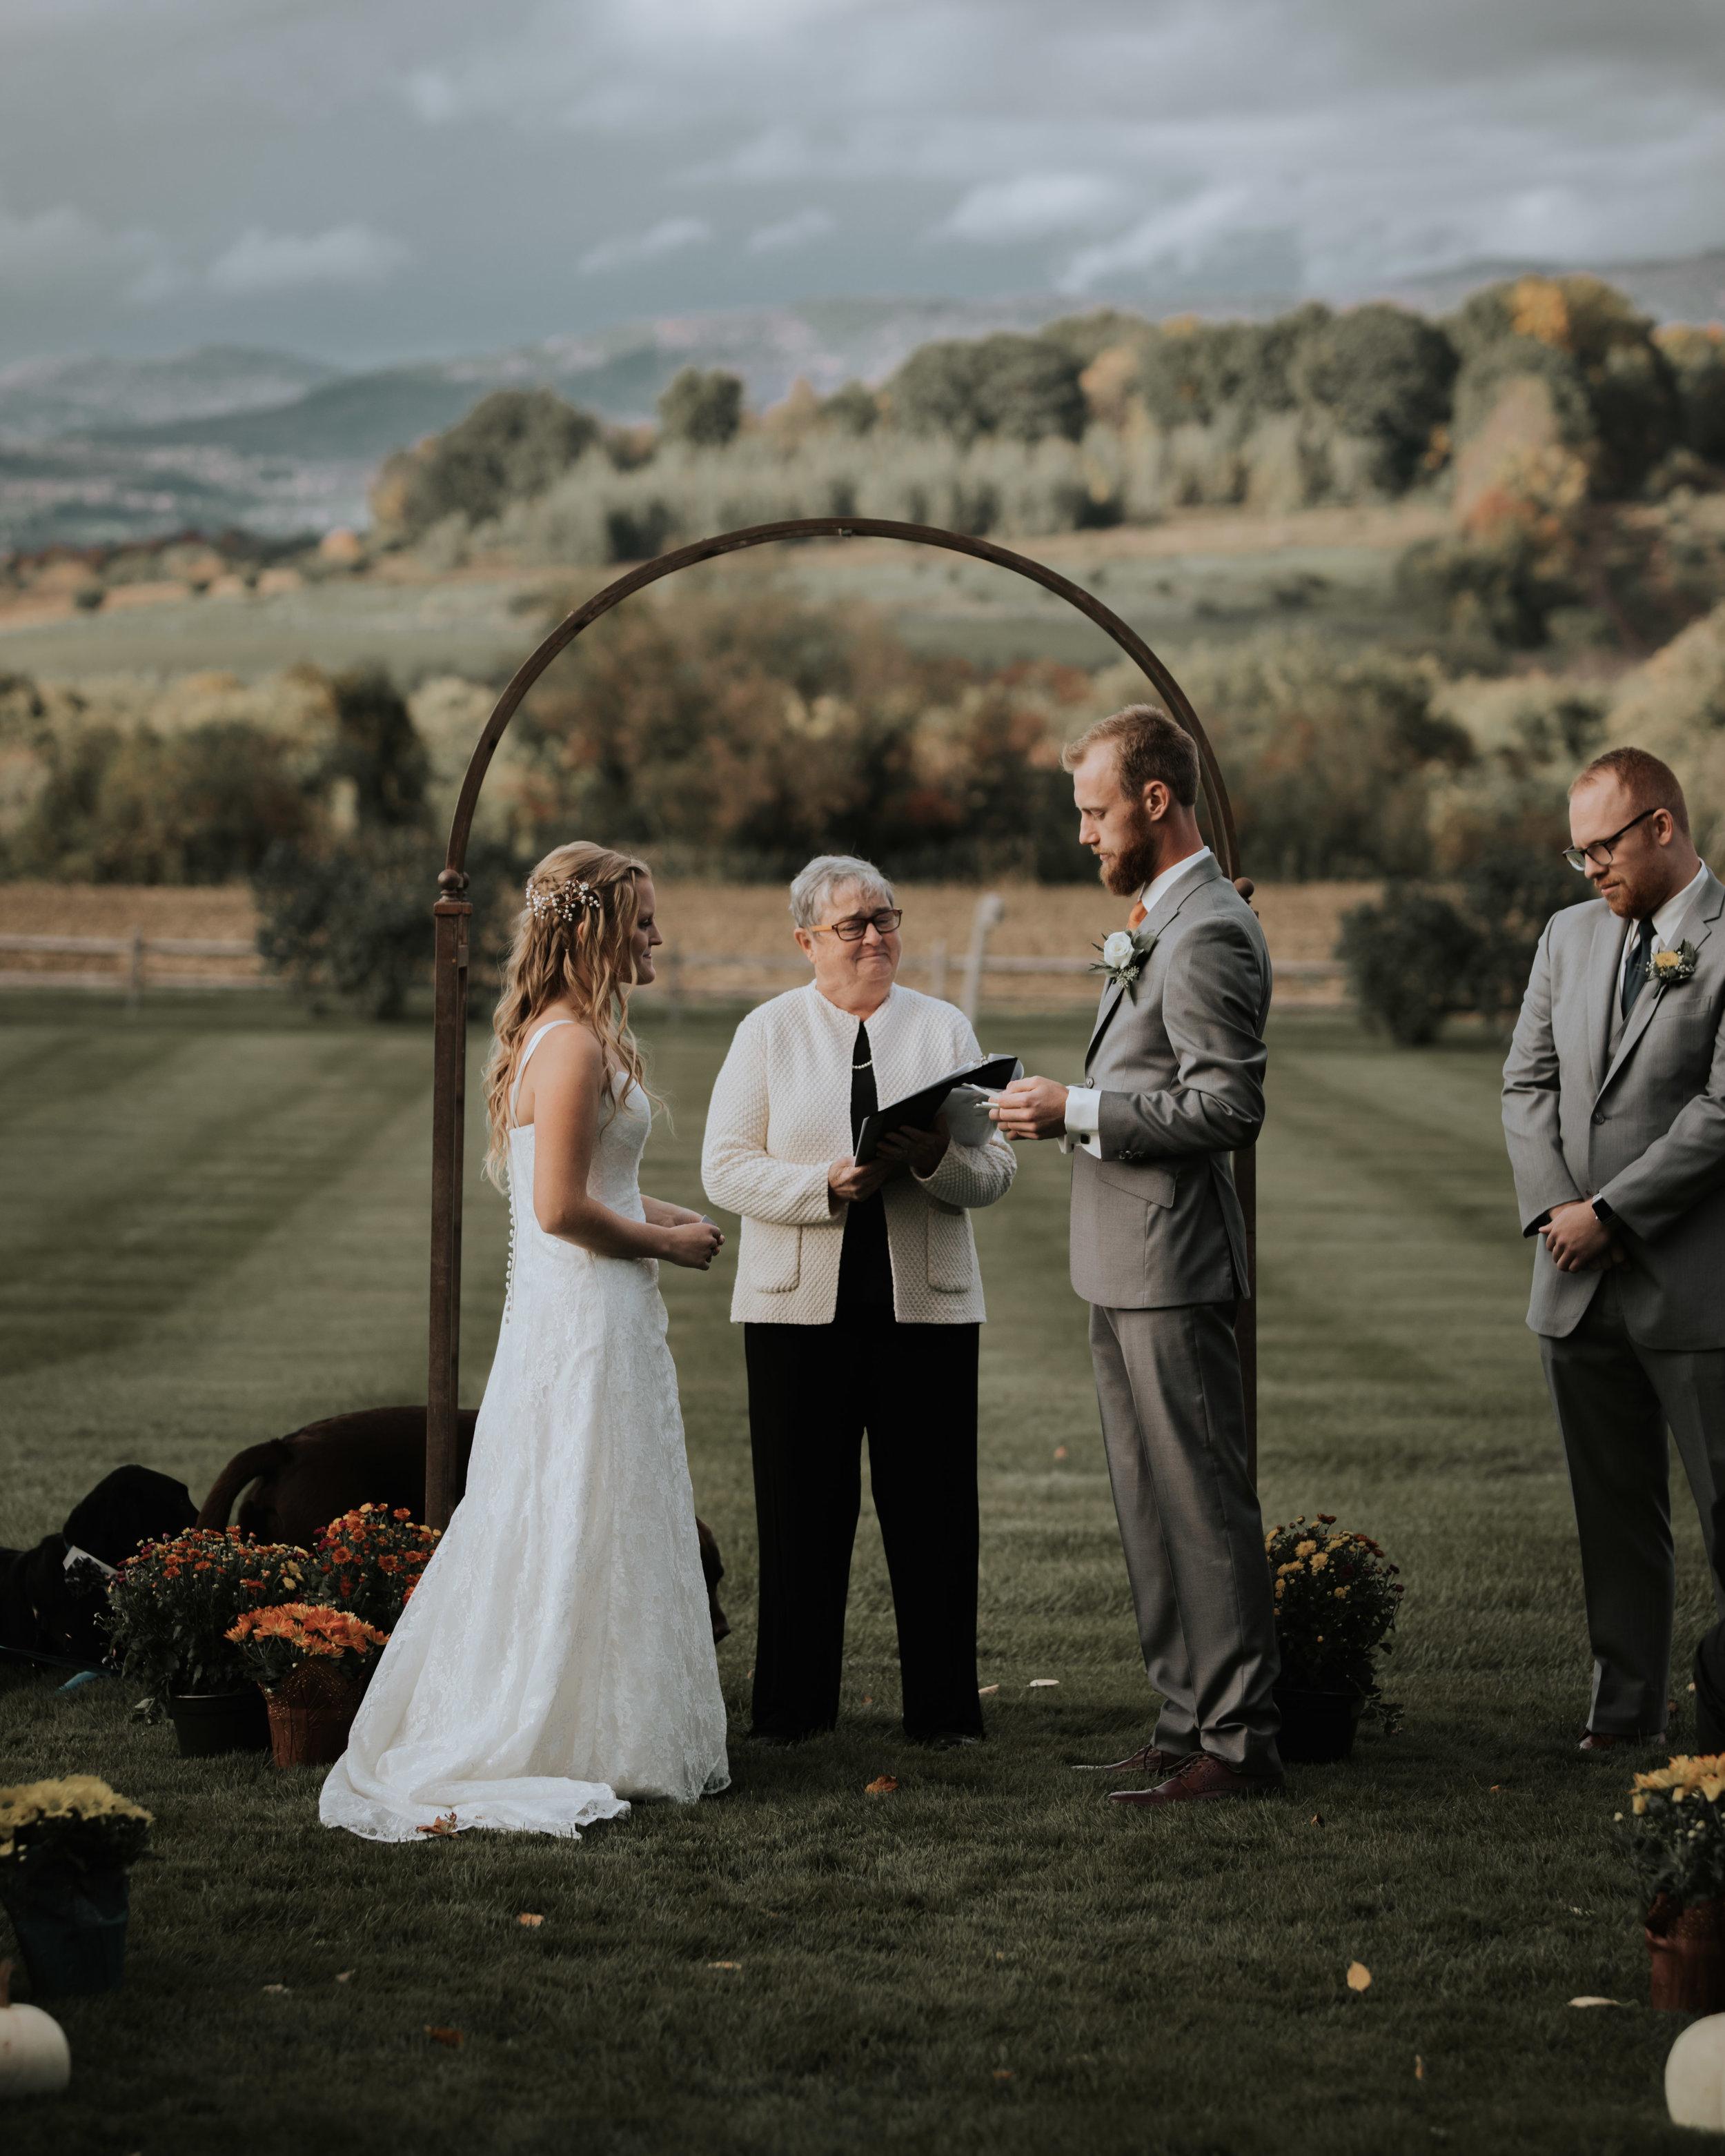 Vermont Wedding | Lorianna Weathers Photography-0564.jpg